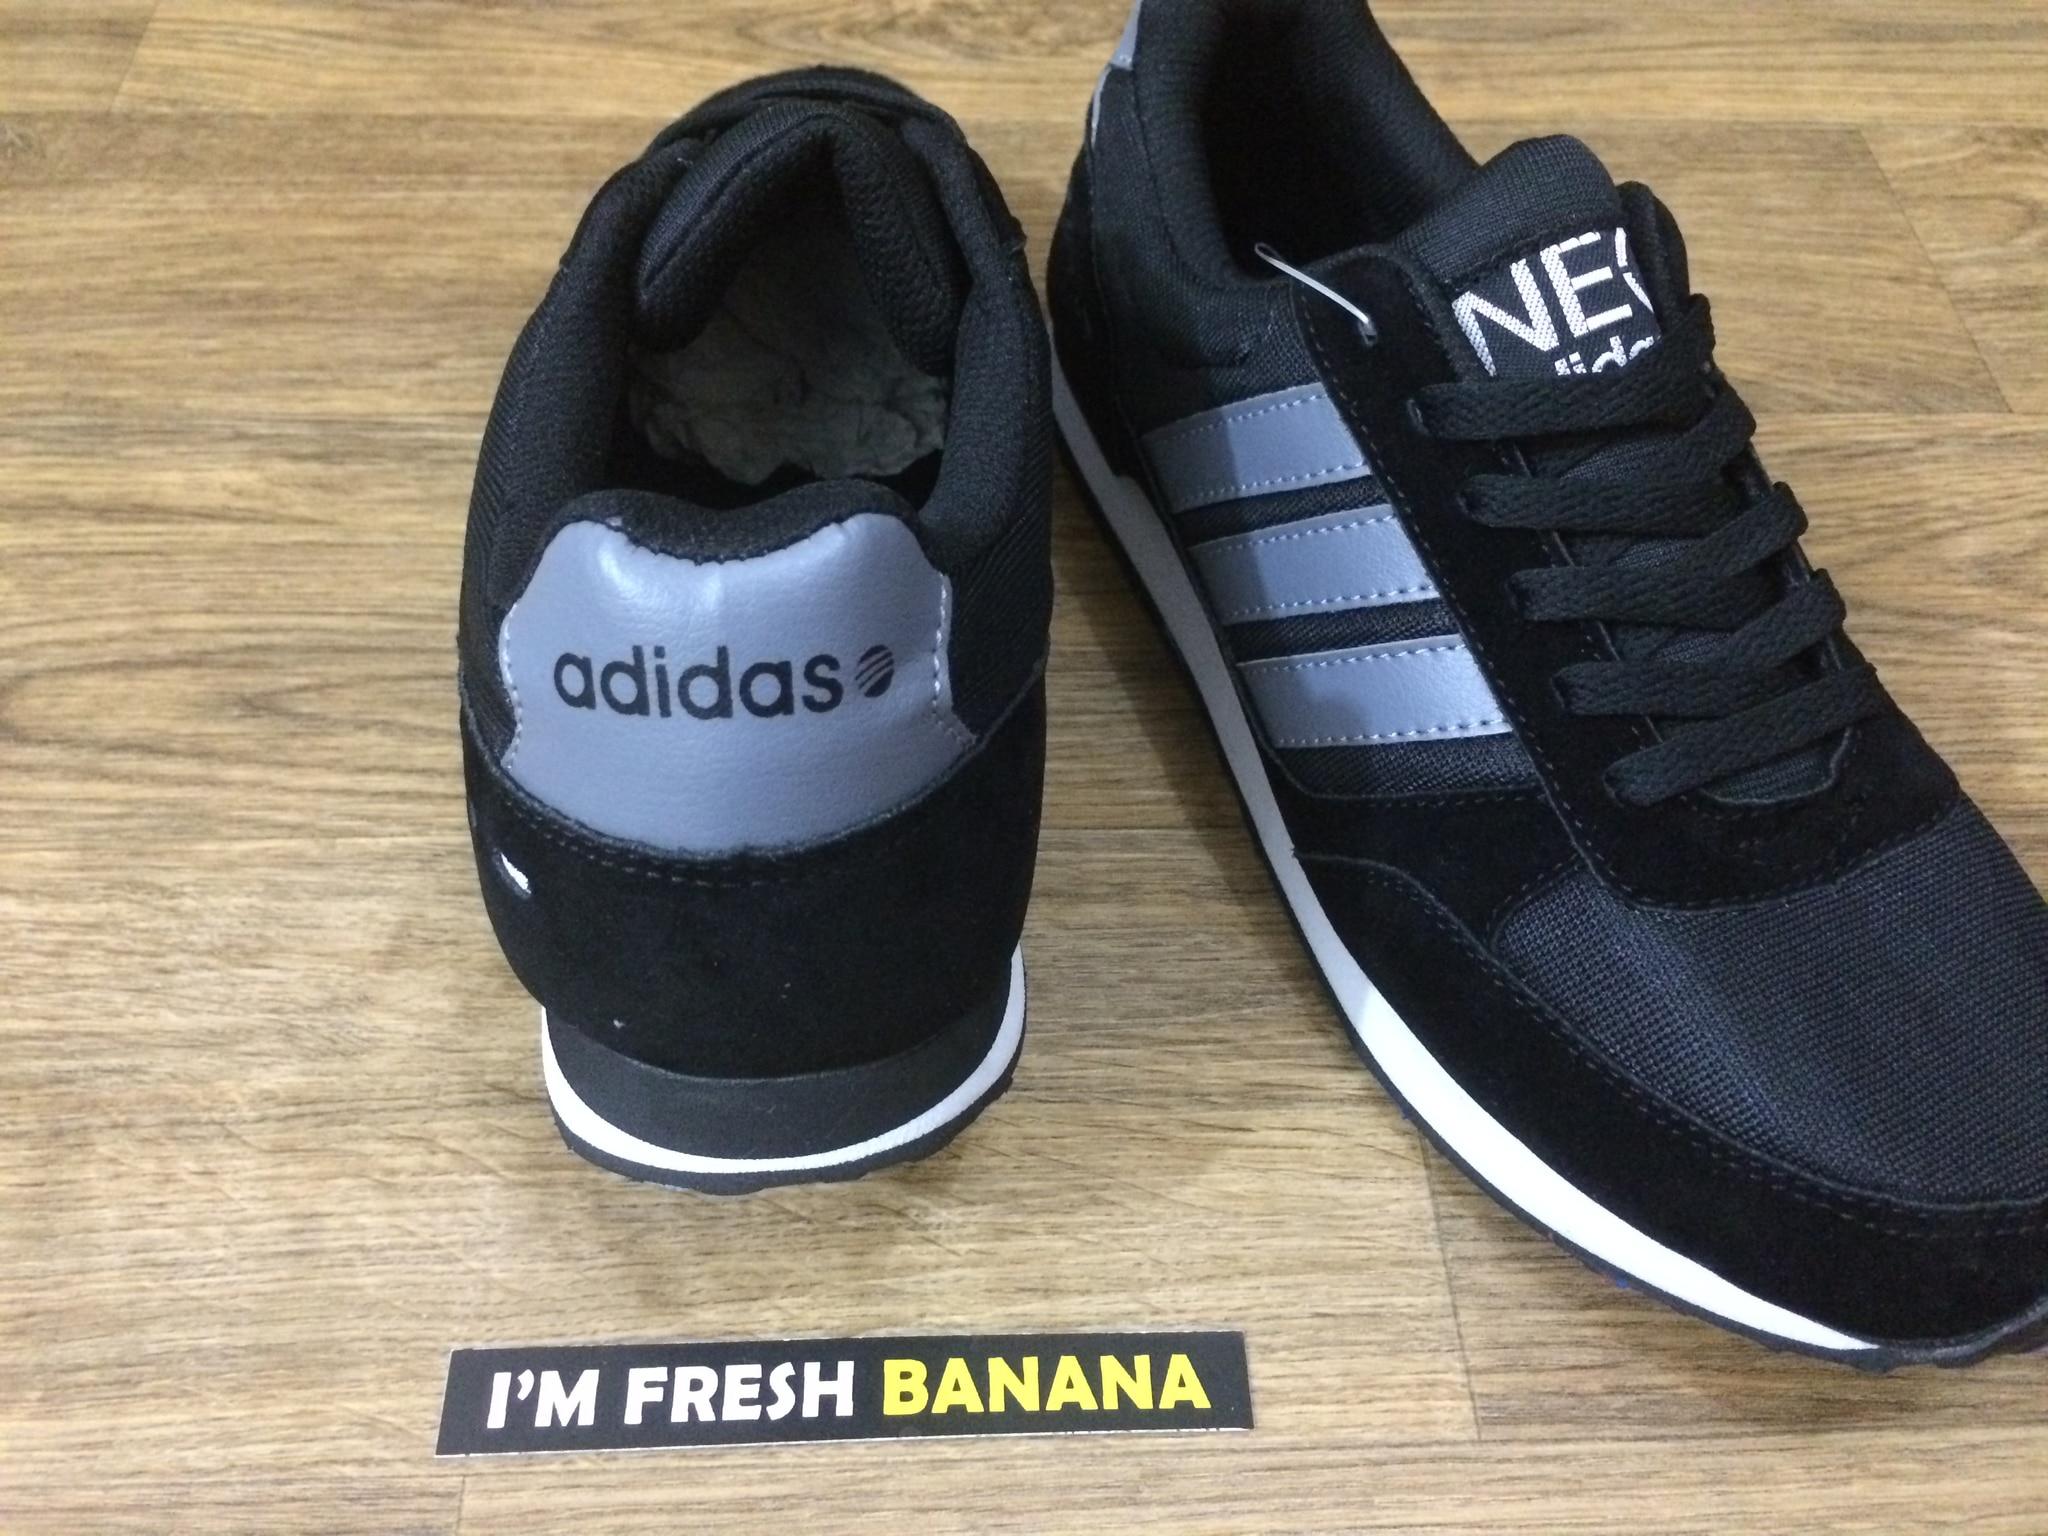 Adidas Neo City Racer Grey Black Hitam Sepatu Cityracer Lacer Runner